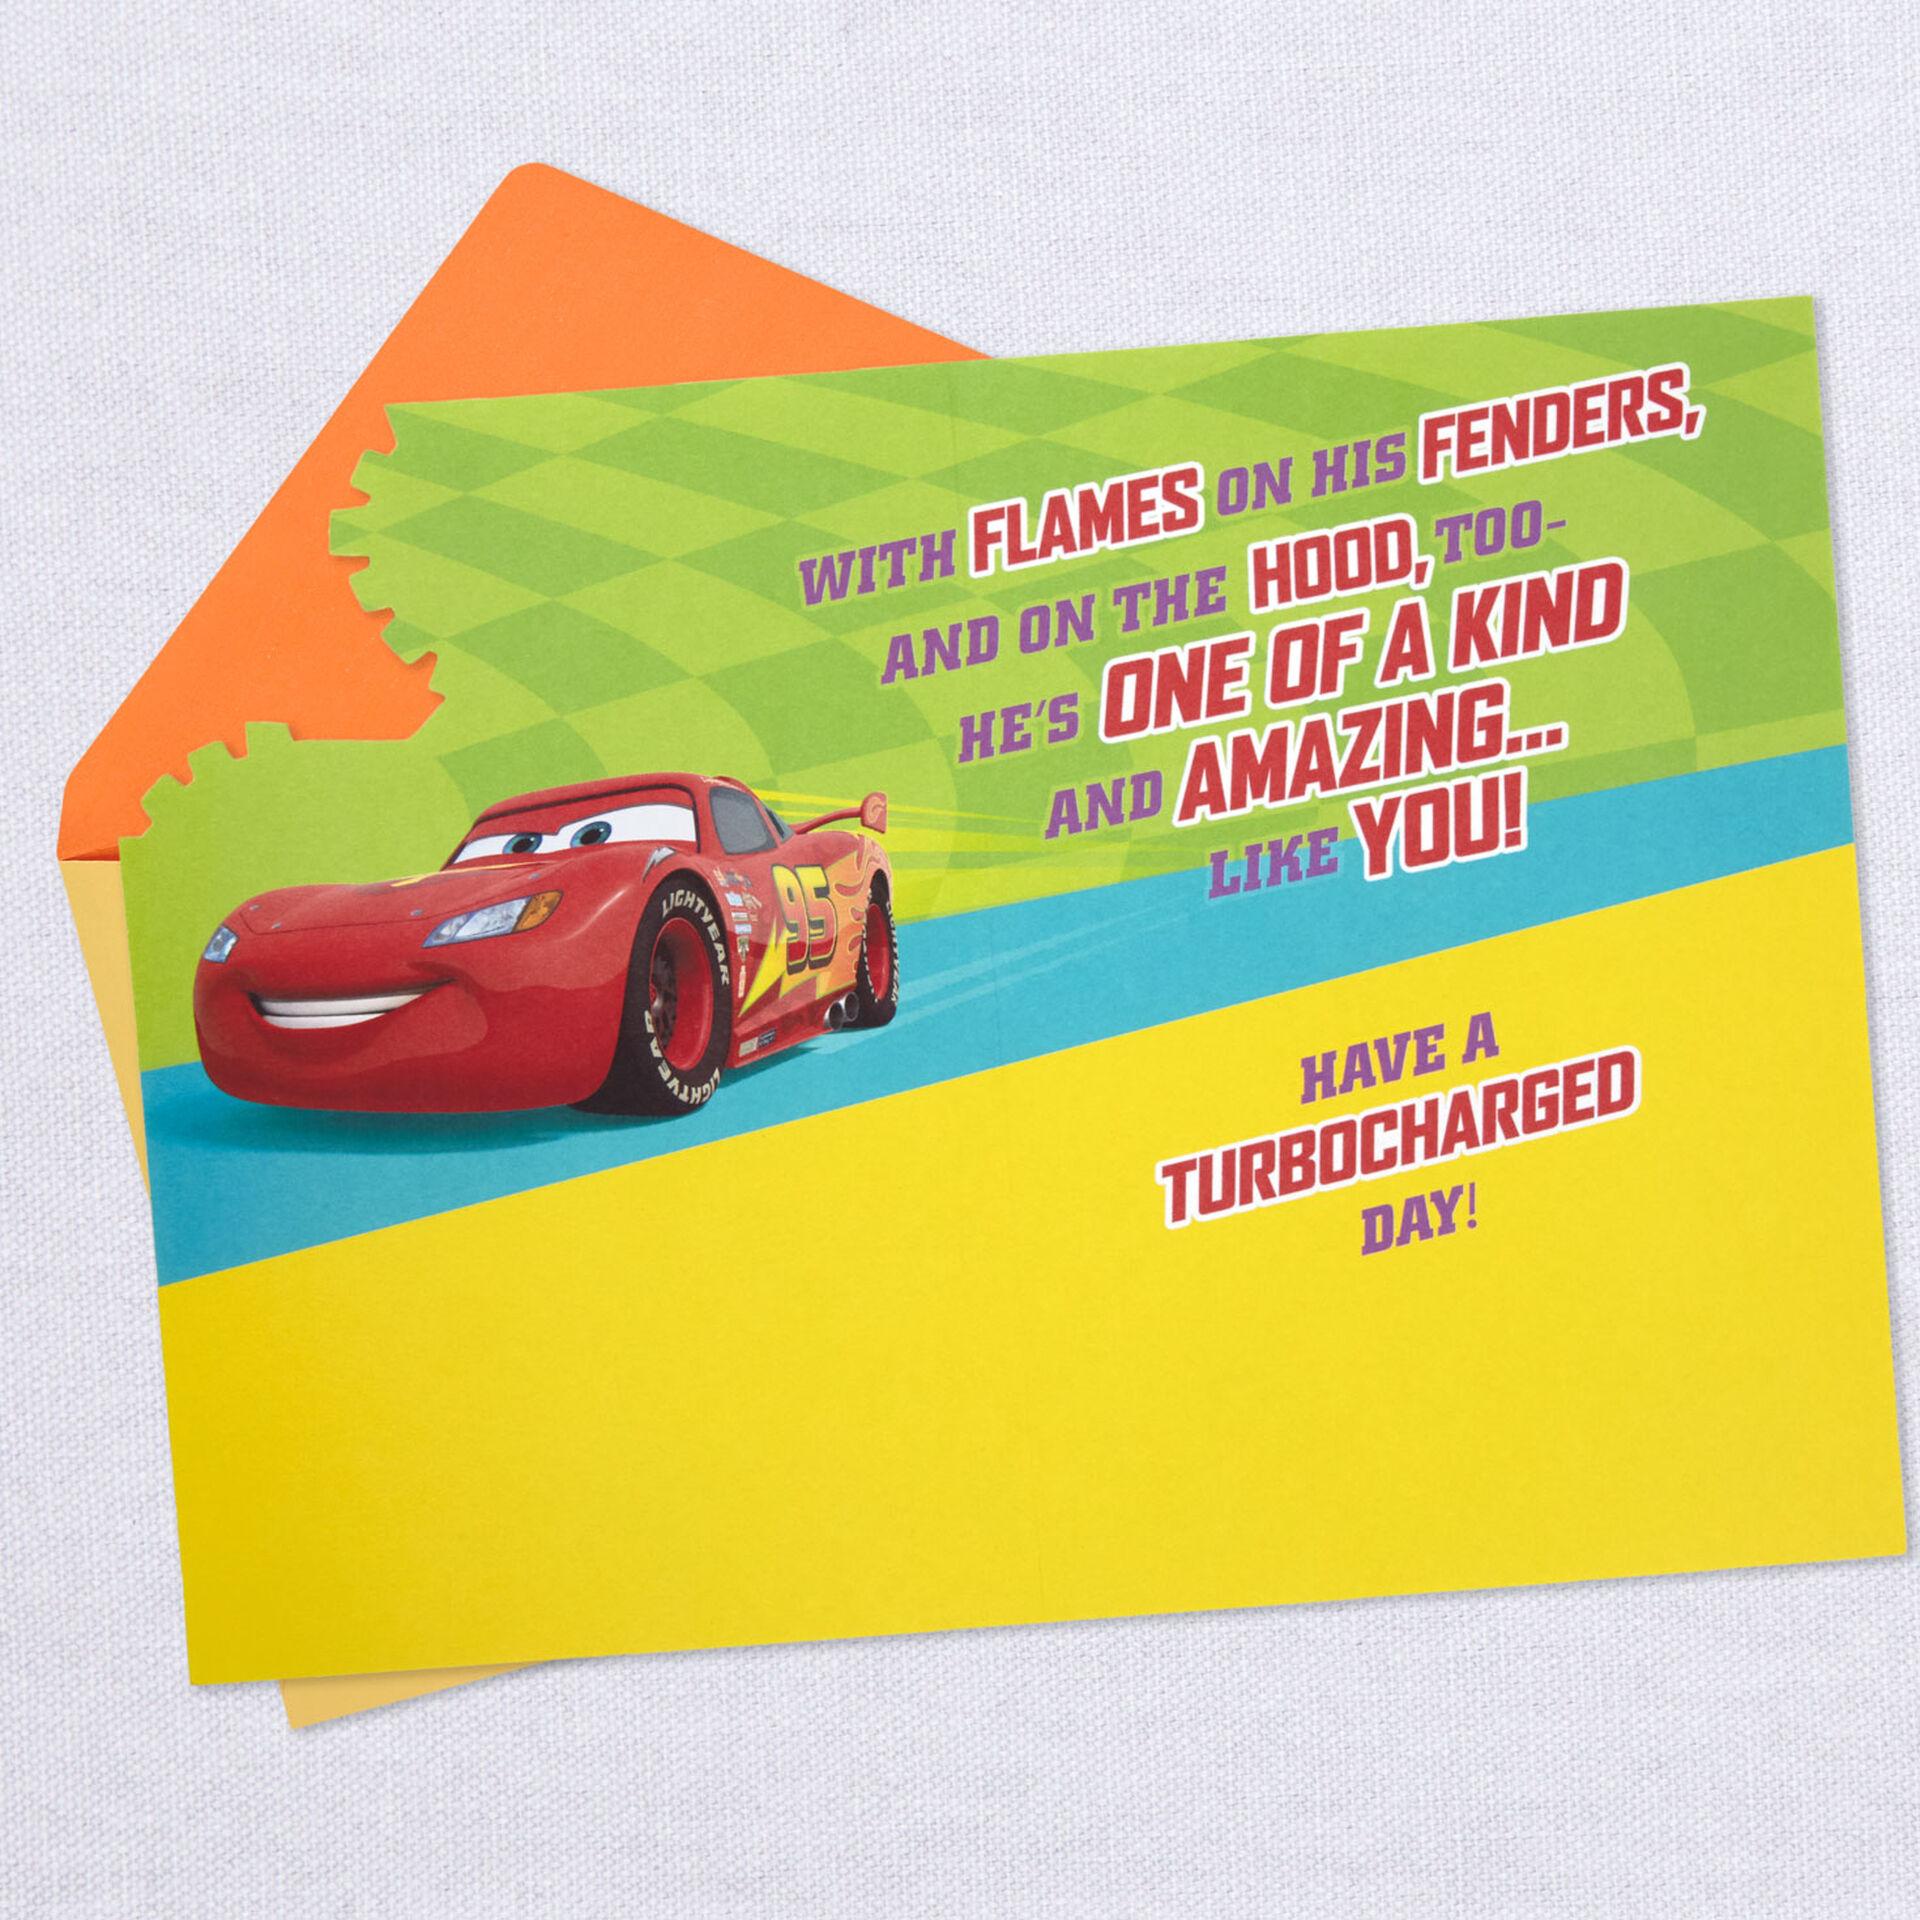 E LIGHTNING MQUEEN Cars Grandson Birthday Card FAST DELIVERY Brand: Hallmark